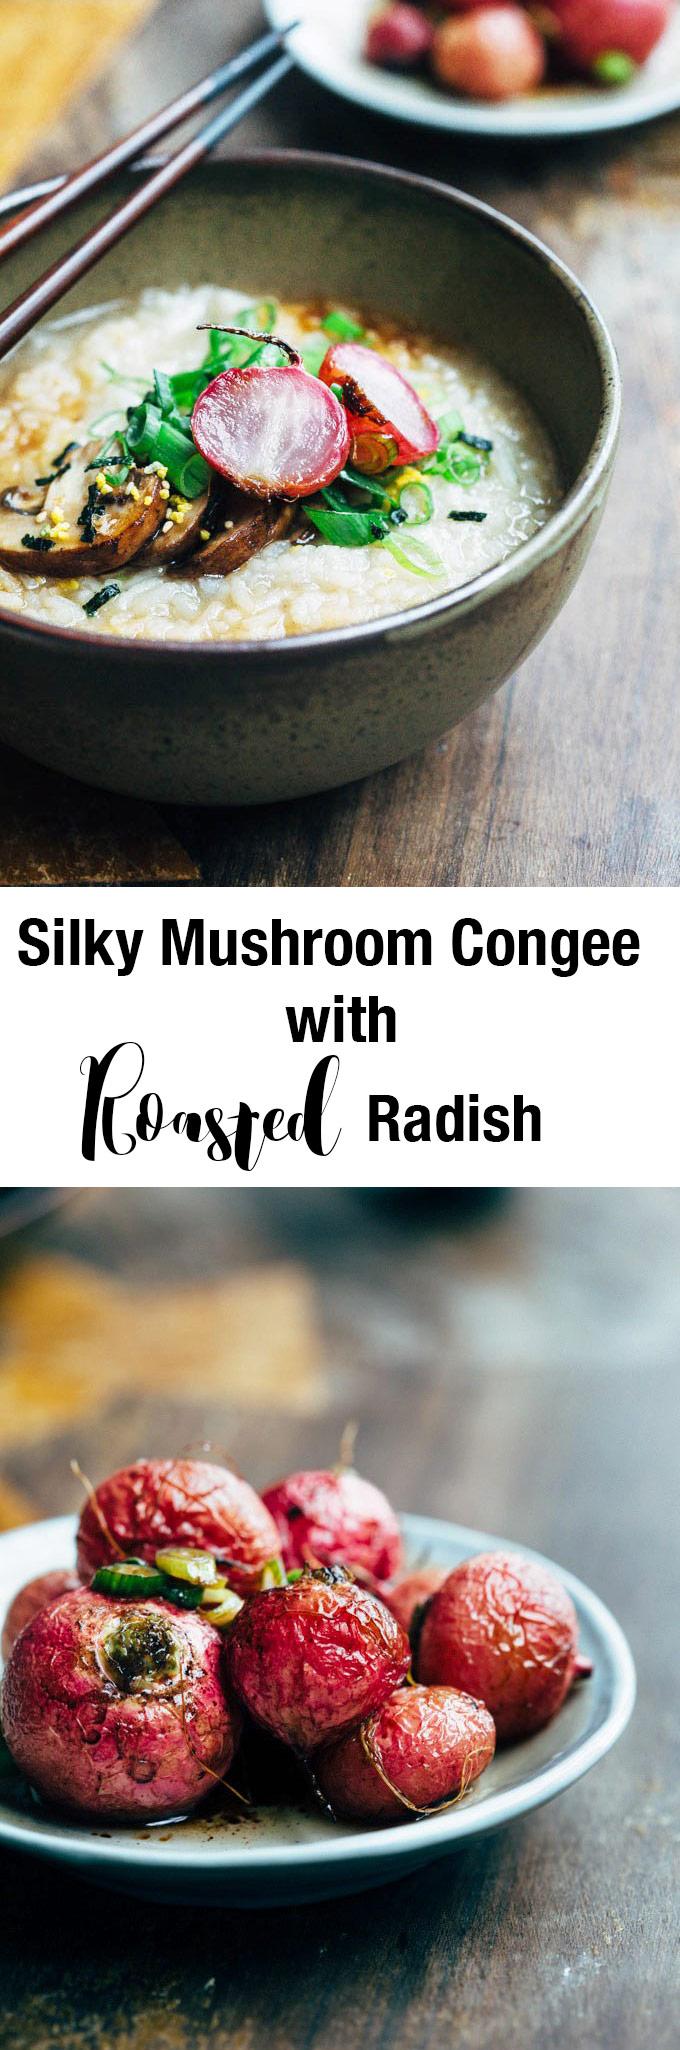 silky-mushroom-congee-with-roast-radish-pin